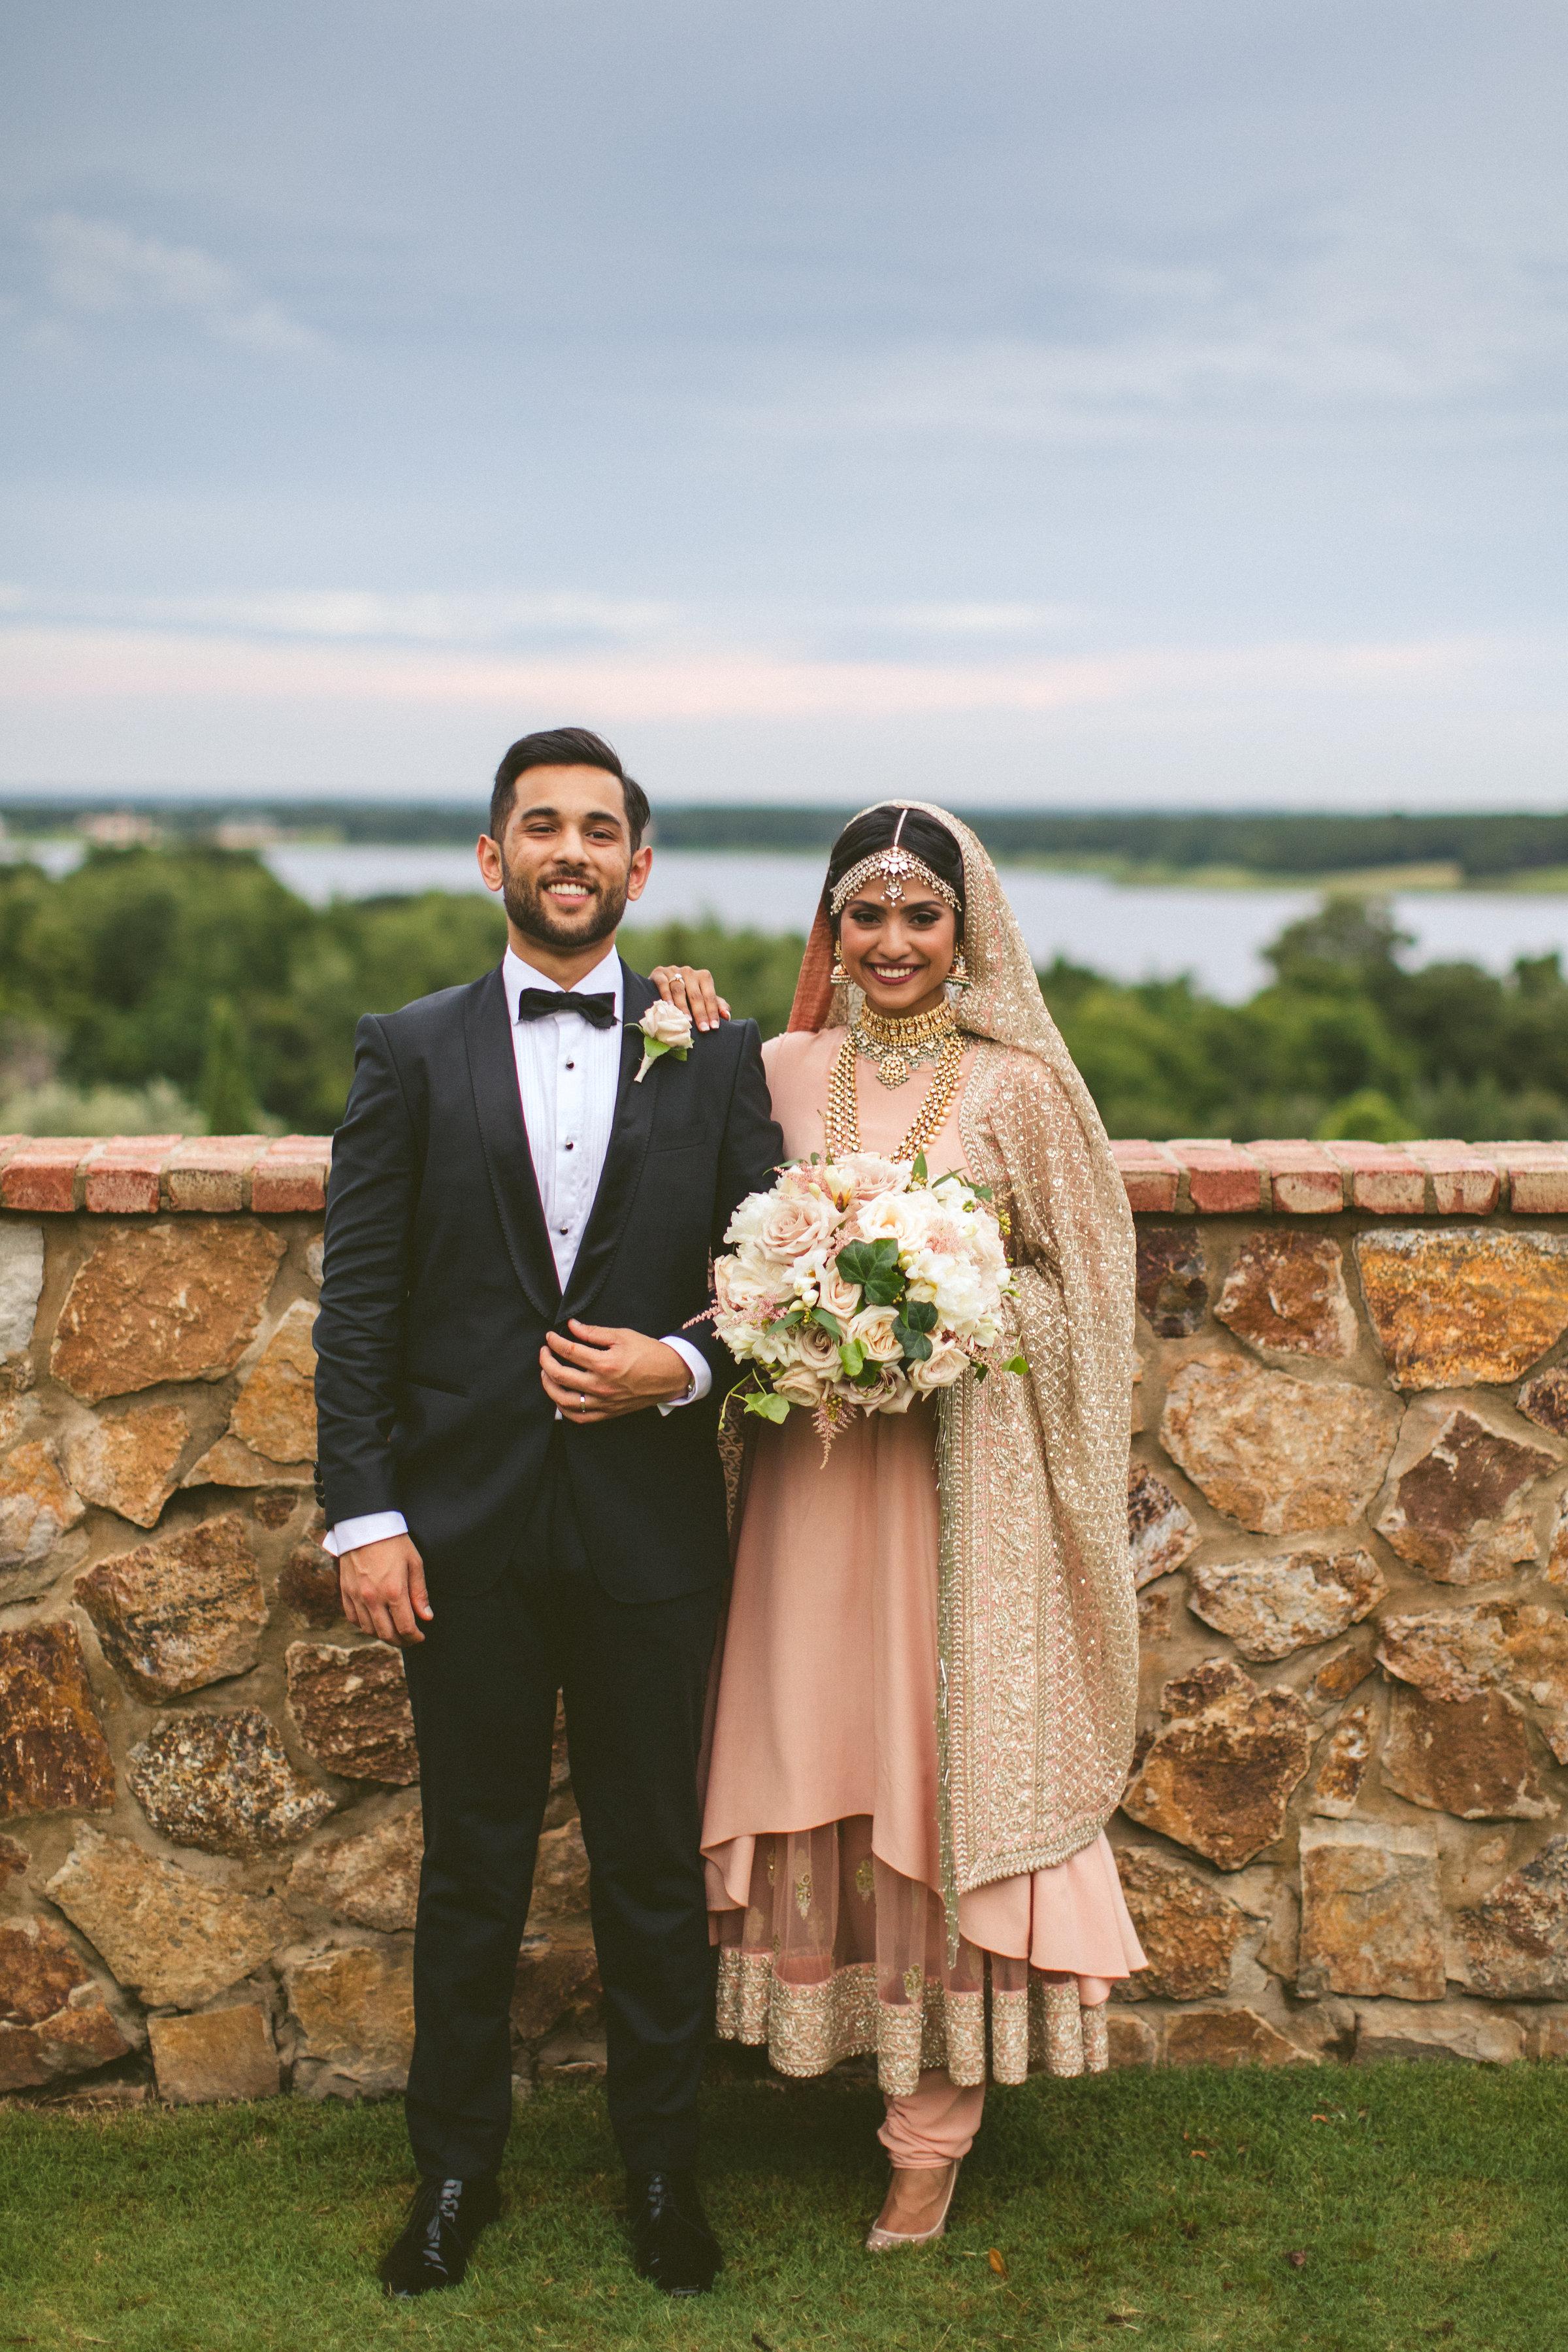 Wedding Photographer:  Concept Photography  | Wedding Coordinator:  Anna Christine Events  | Wedding Location: Bella Collina